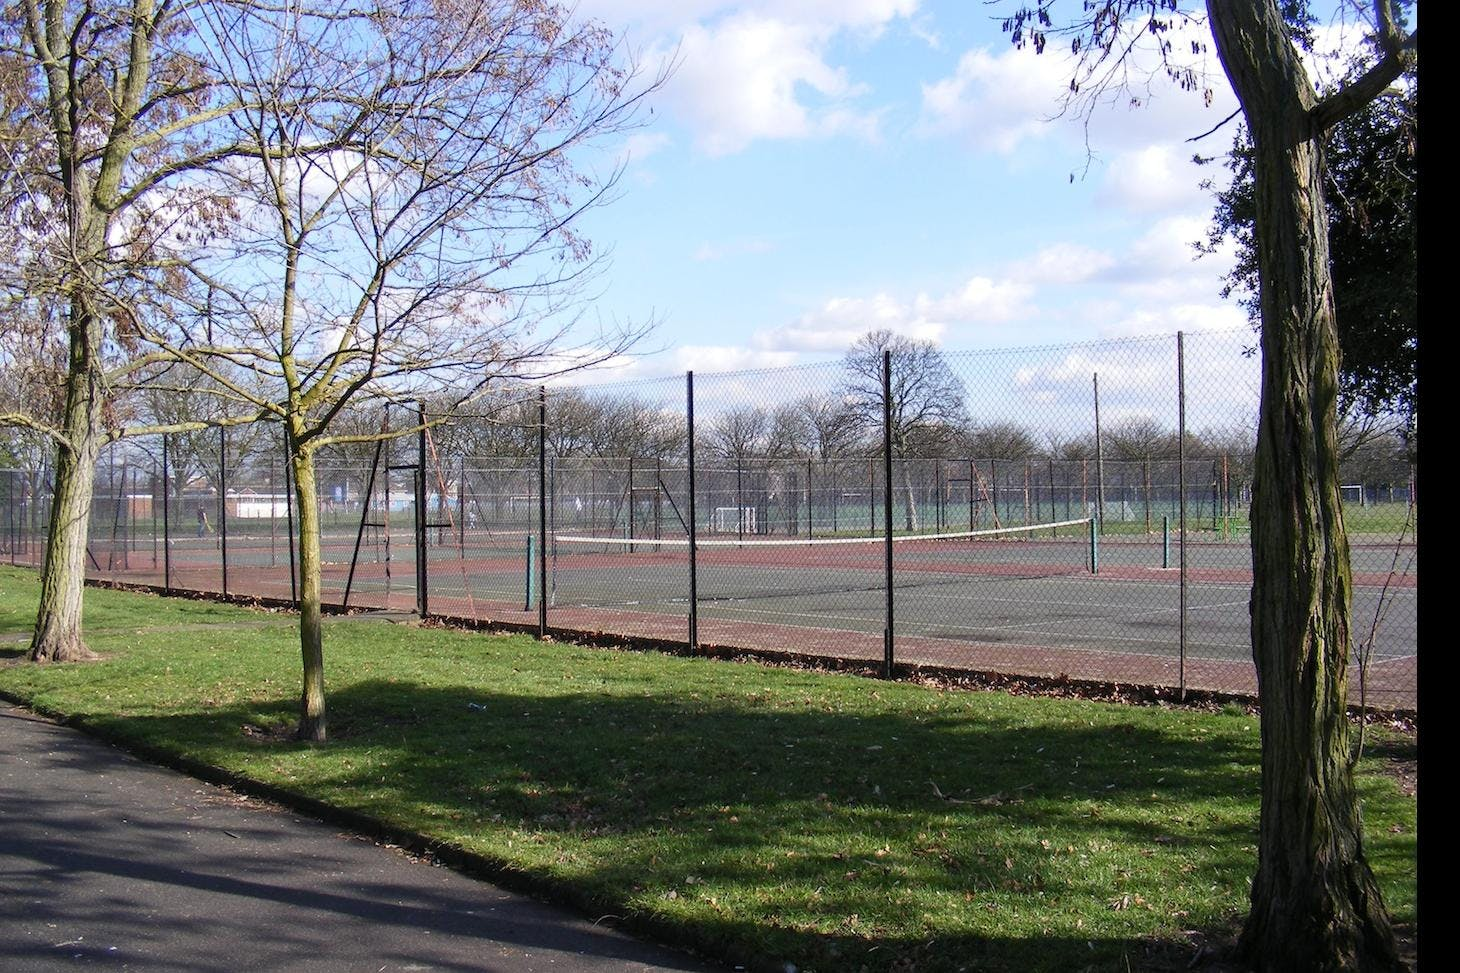 Barking Park Outdoor   Hard (macadam) tennis court